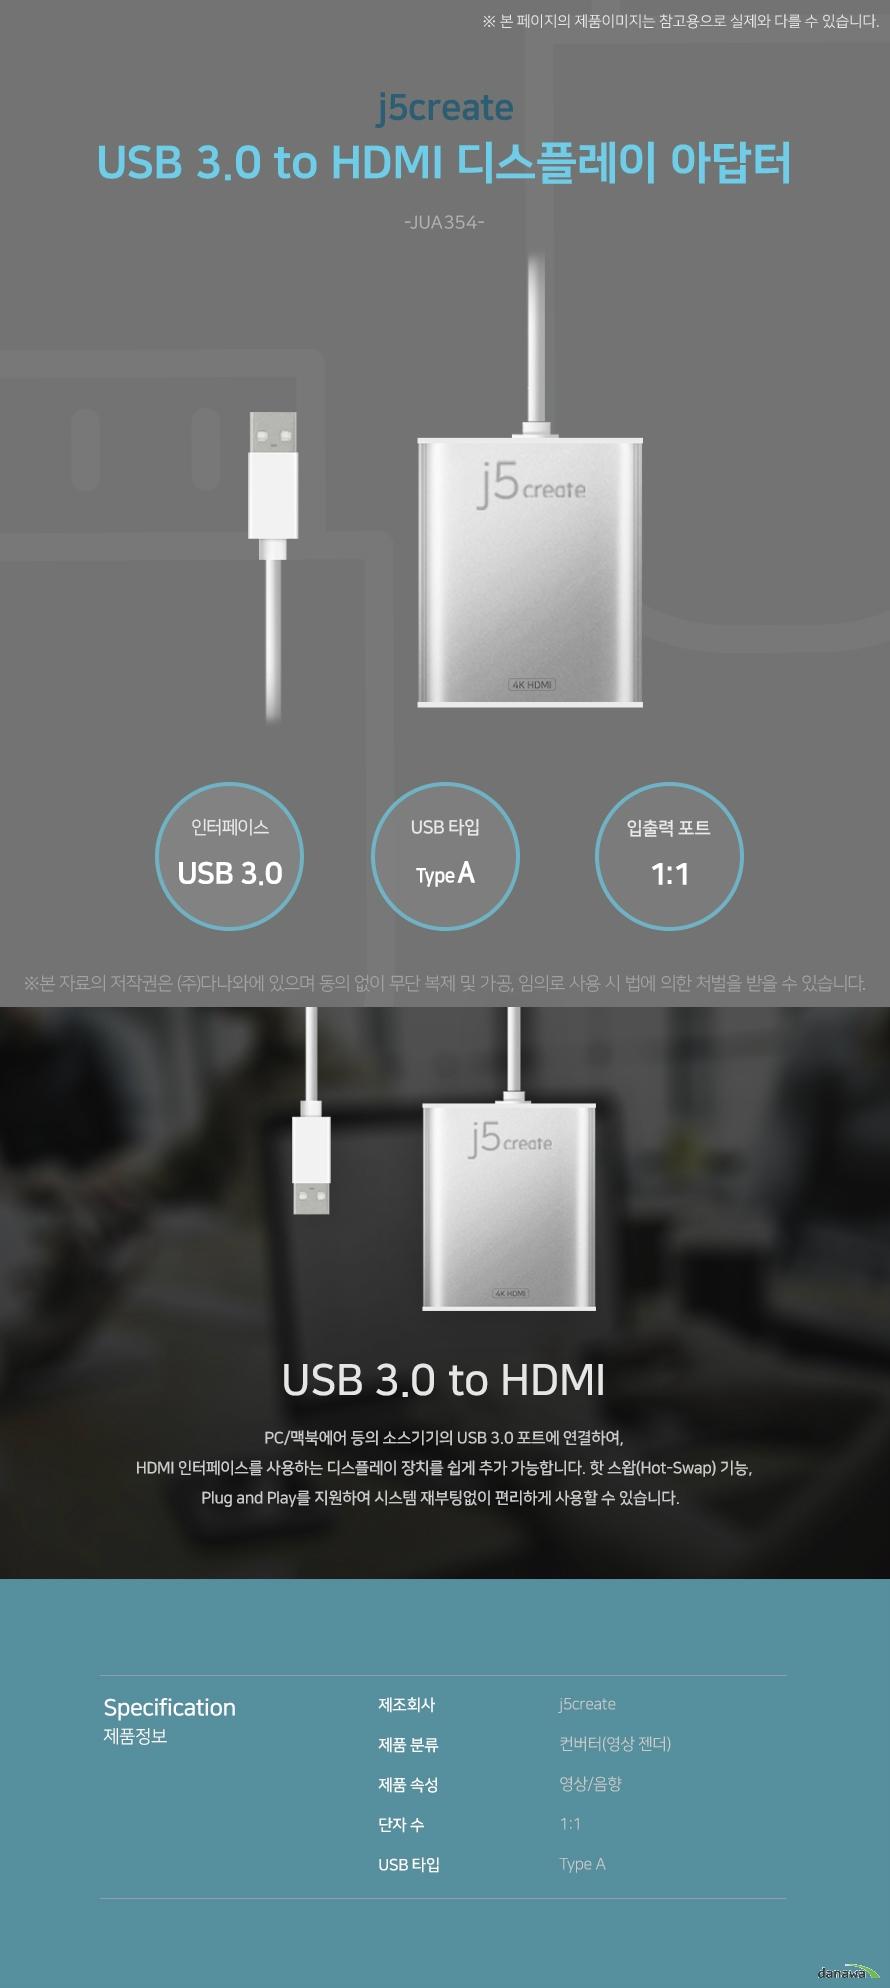 j5create USB 3.0 to HDMI 디스플레이 아답터 (JUA354) 인터페이스 USB 3.0 USB타입 Type A 입출력 포트 1:1 USB 3.0 to HDMI PC/맥북에어 등의 소스기기의 USB 3.0 포트에 연결하여 HDMI 인터페이스를 사용하는   디스플레이 장치를 쉽게 추가 가능합니다. 핫 스왑 기능, 플러그 앤 플레이를 지원하  여 시스템 재부팅없이 편리하게 사용할 수 있습니다. 스펙 제조회사 j5create 제품 분류 컨버터(영상 젠더) 제품 속성 영상/음향 단자 수 1:1 USB 타입 Type A